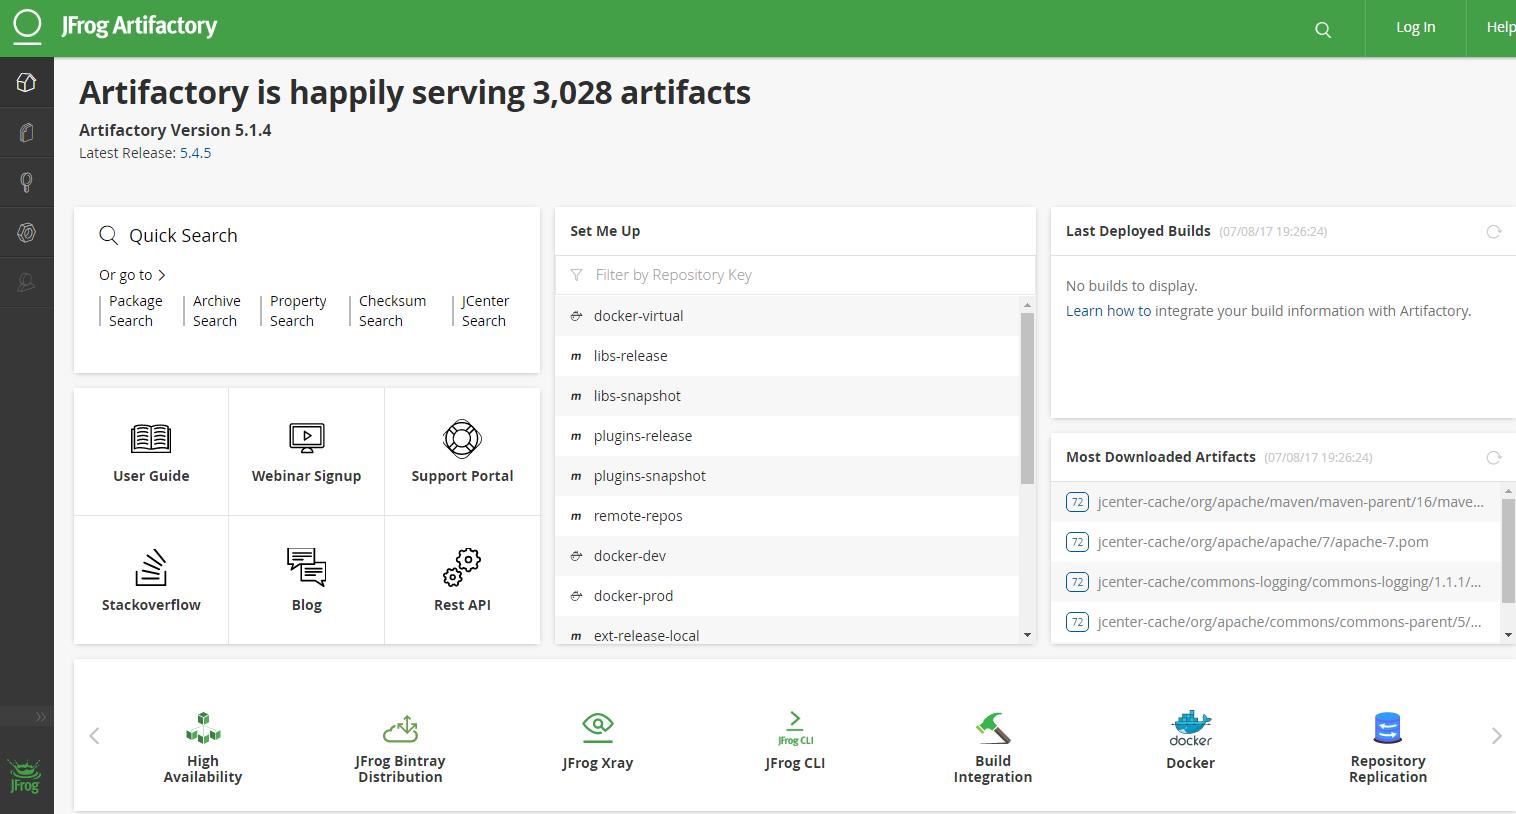 JFrog Artifactory — NetApp Jenkins Framework 2 0 documentation